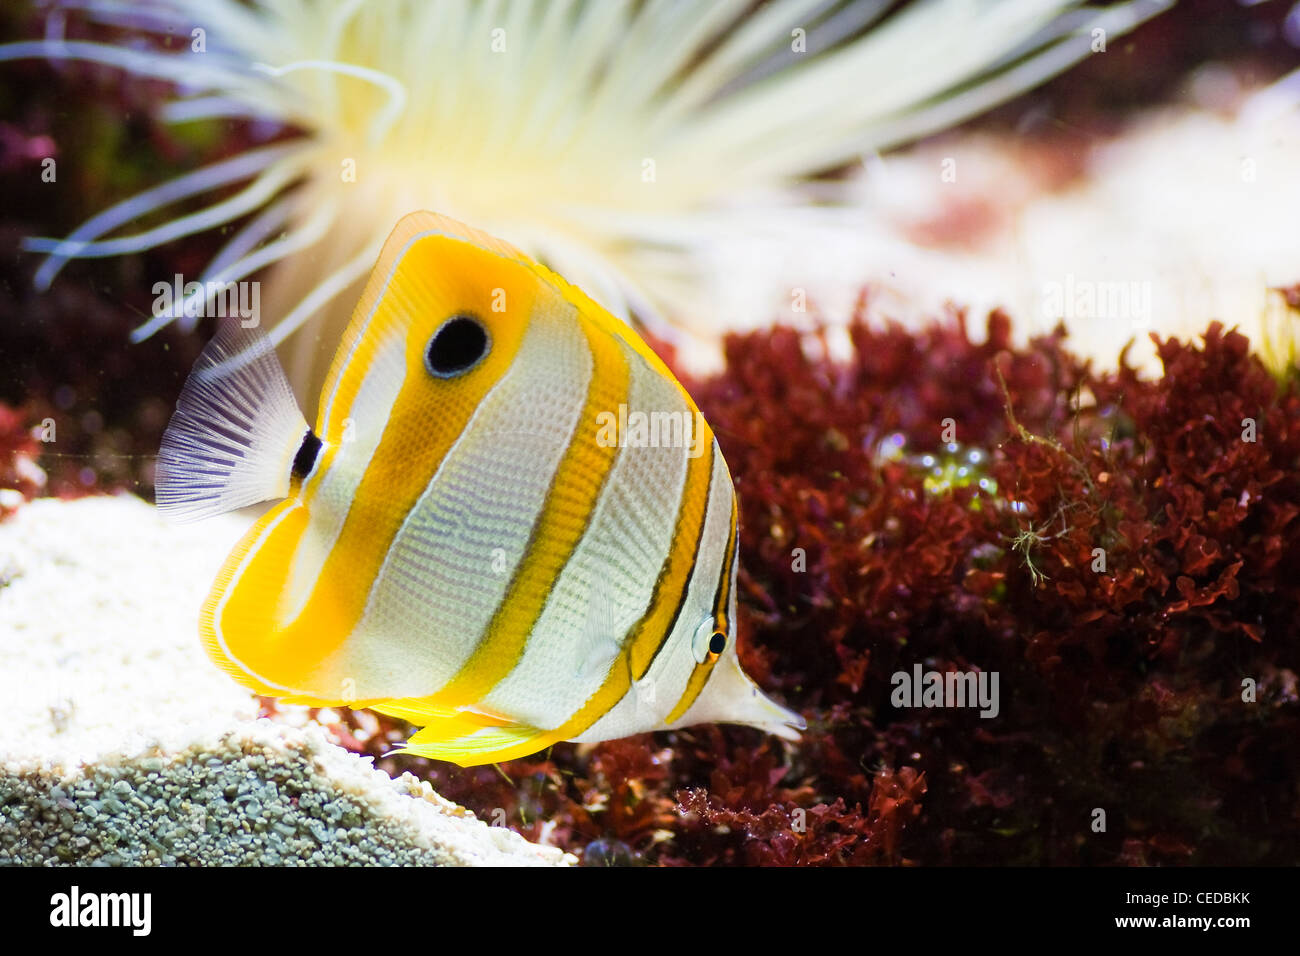 Copperband Butterflyfish, Beak Coralfish or Chelmon rostratus with sea anemone - Stock Image